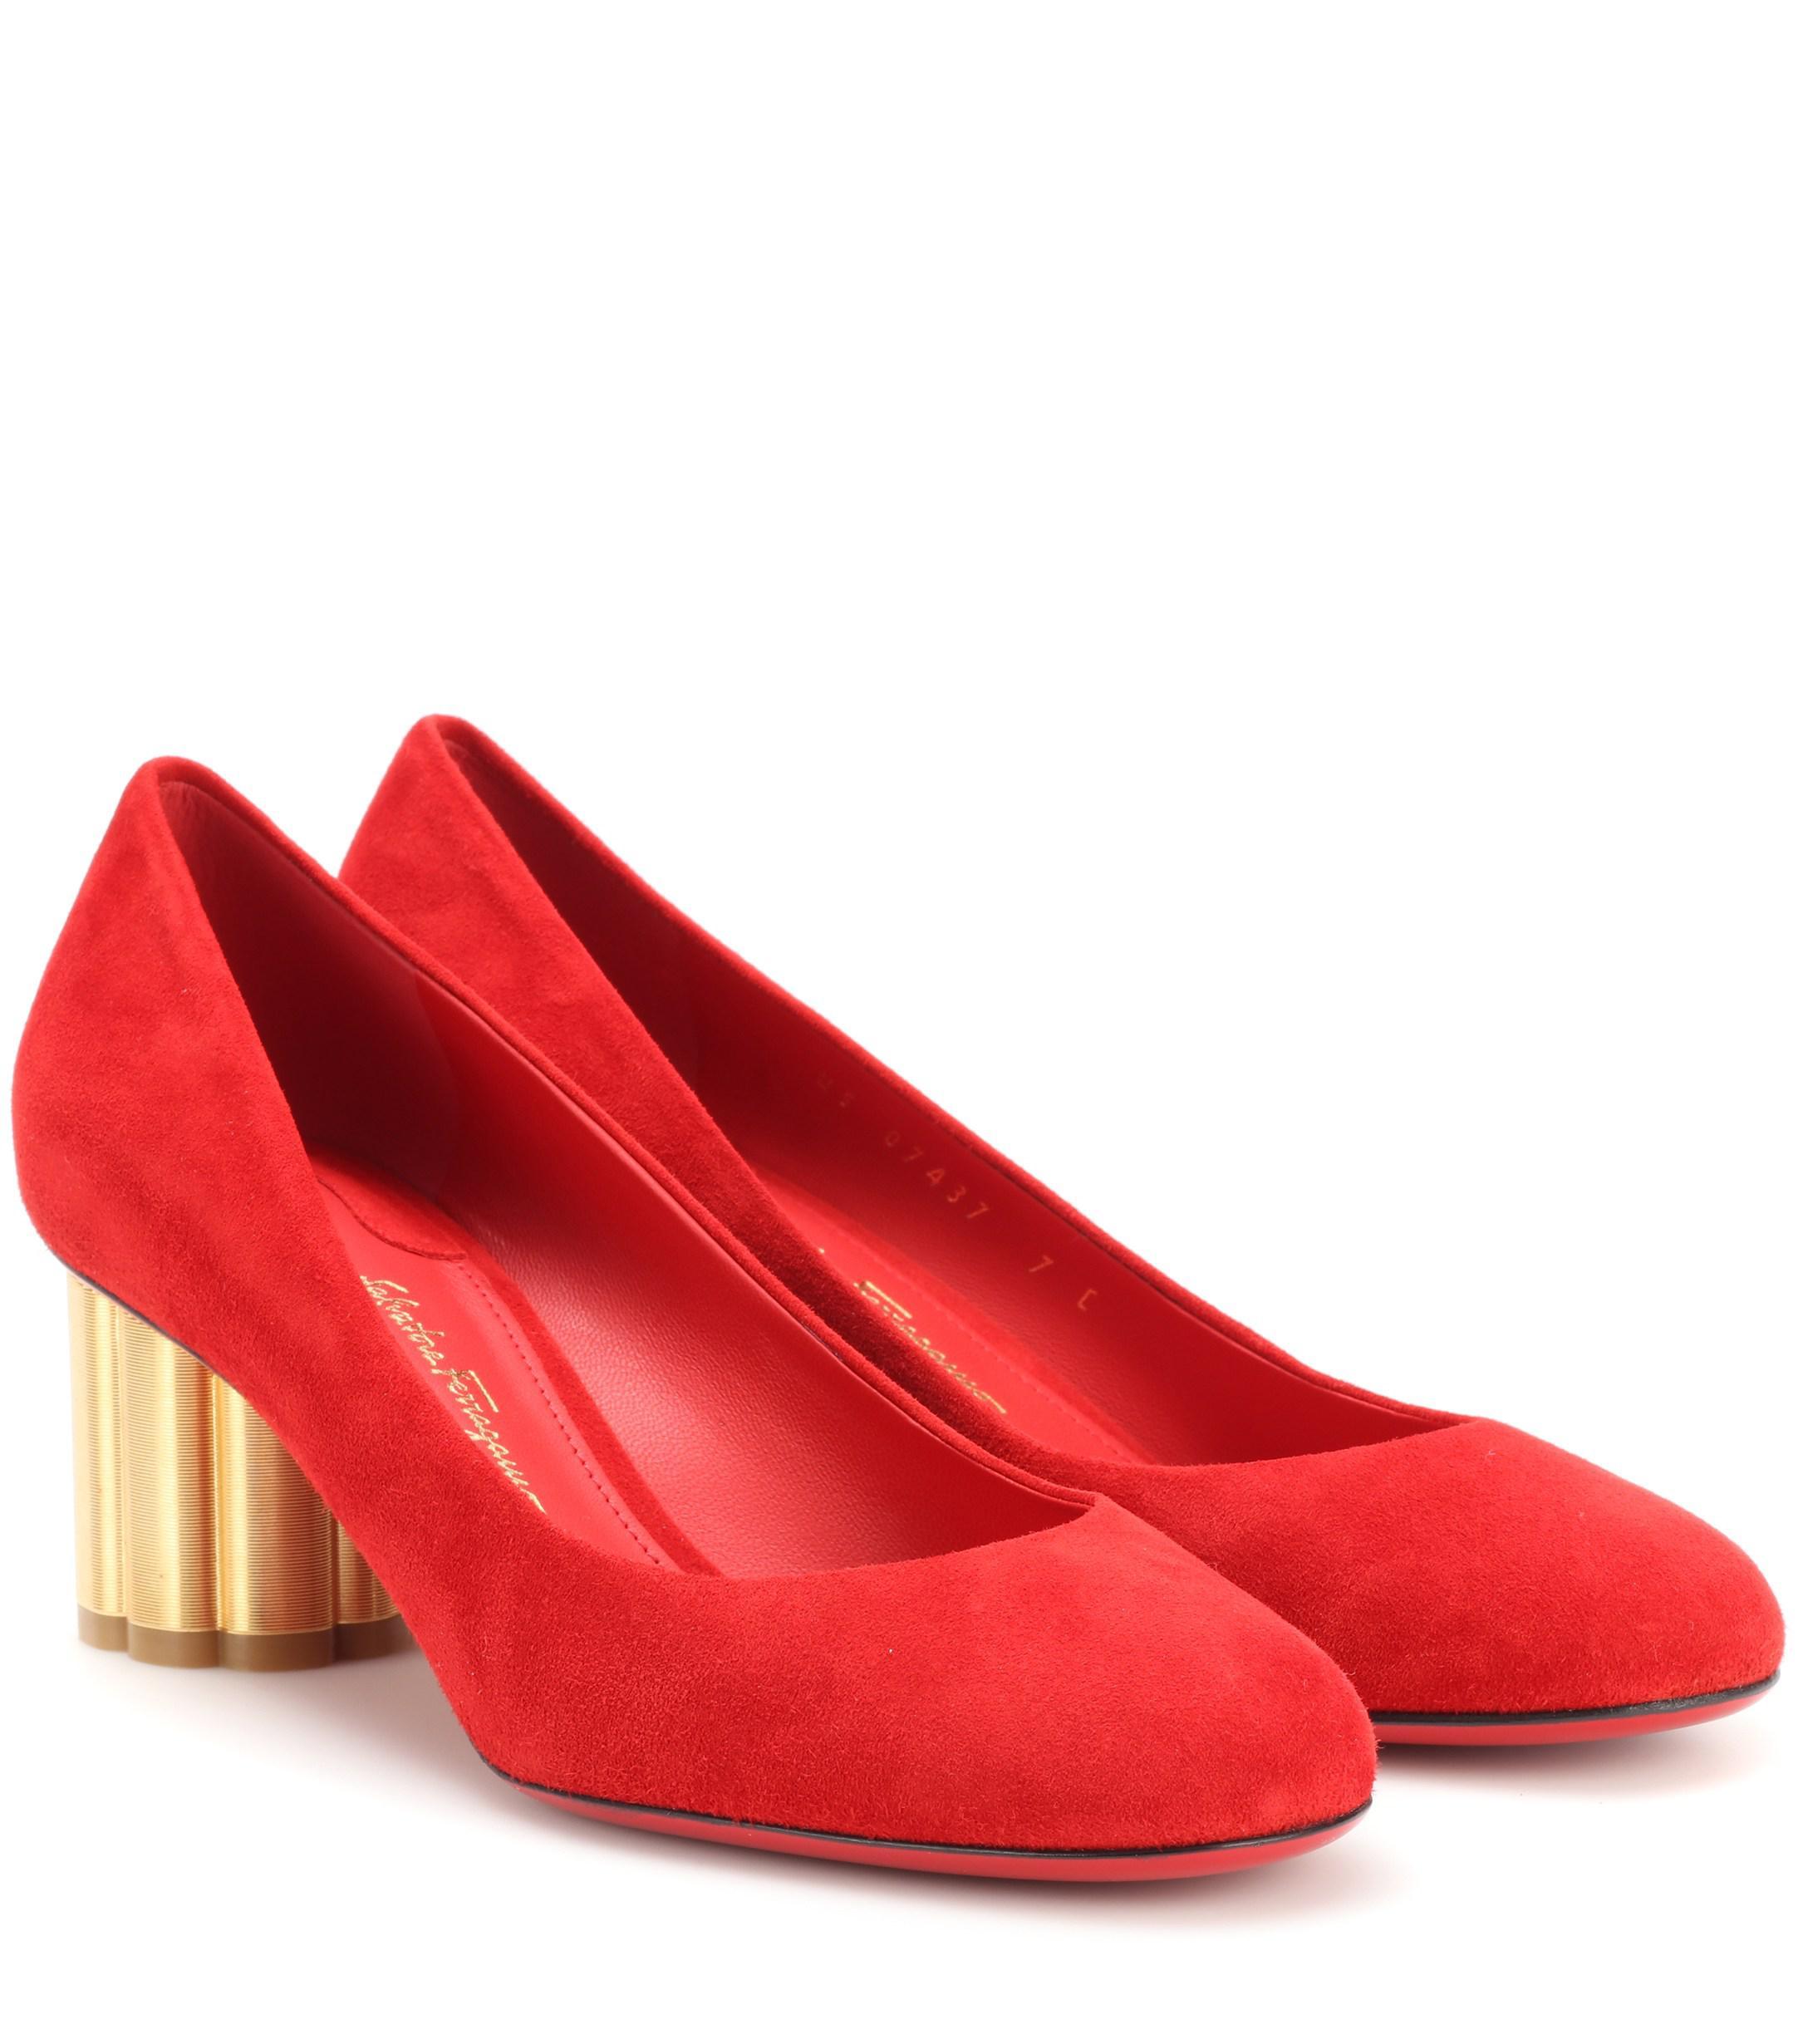 c8b59ca5e2c8 Ferragamo. Women s Red Lucca 55 Suede Court Shoes